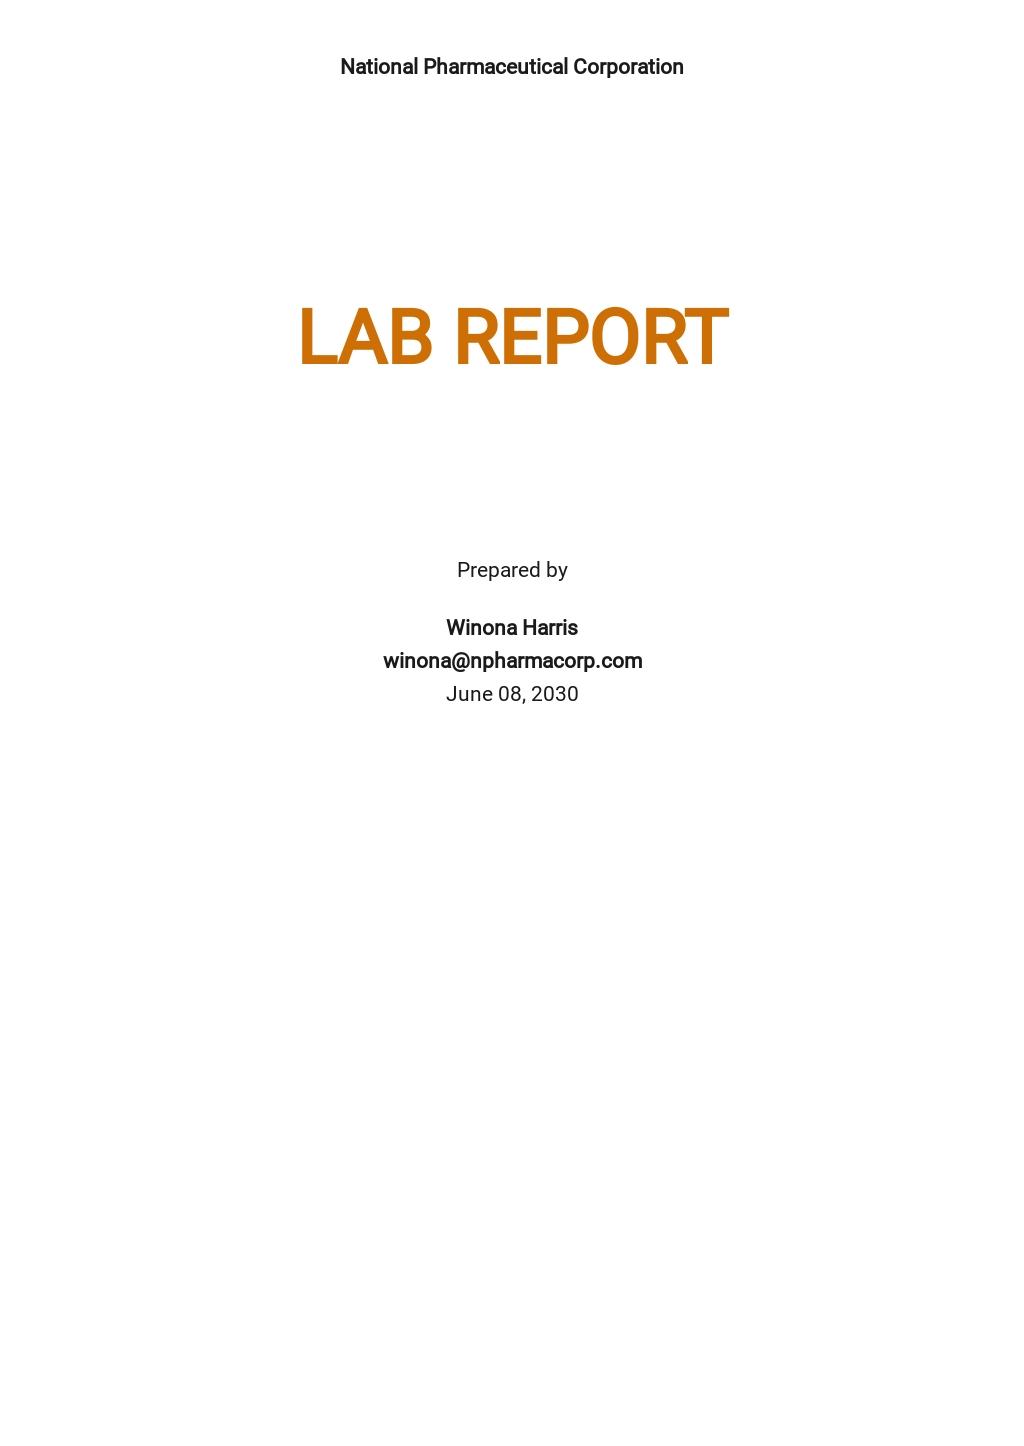 Lab Report Template.jpe